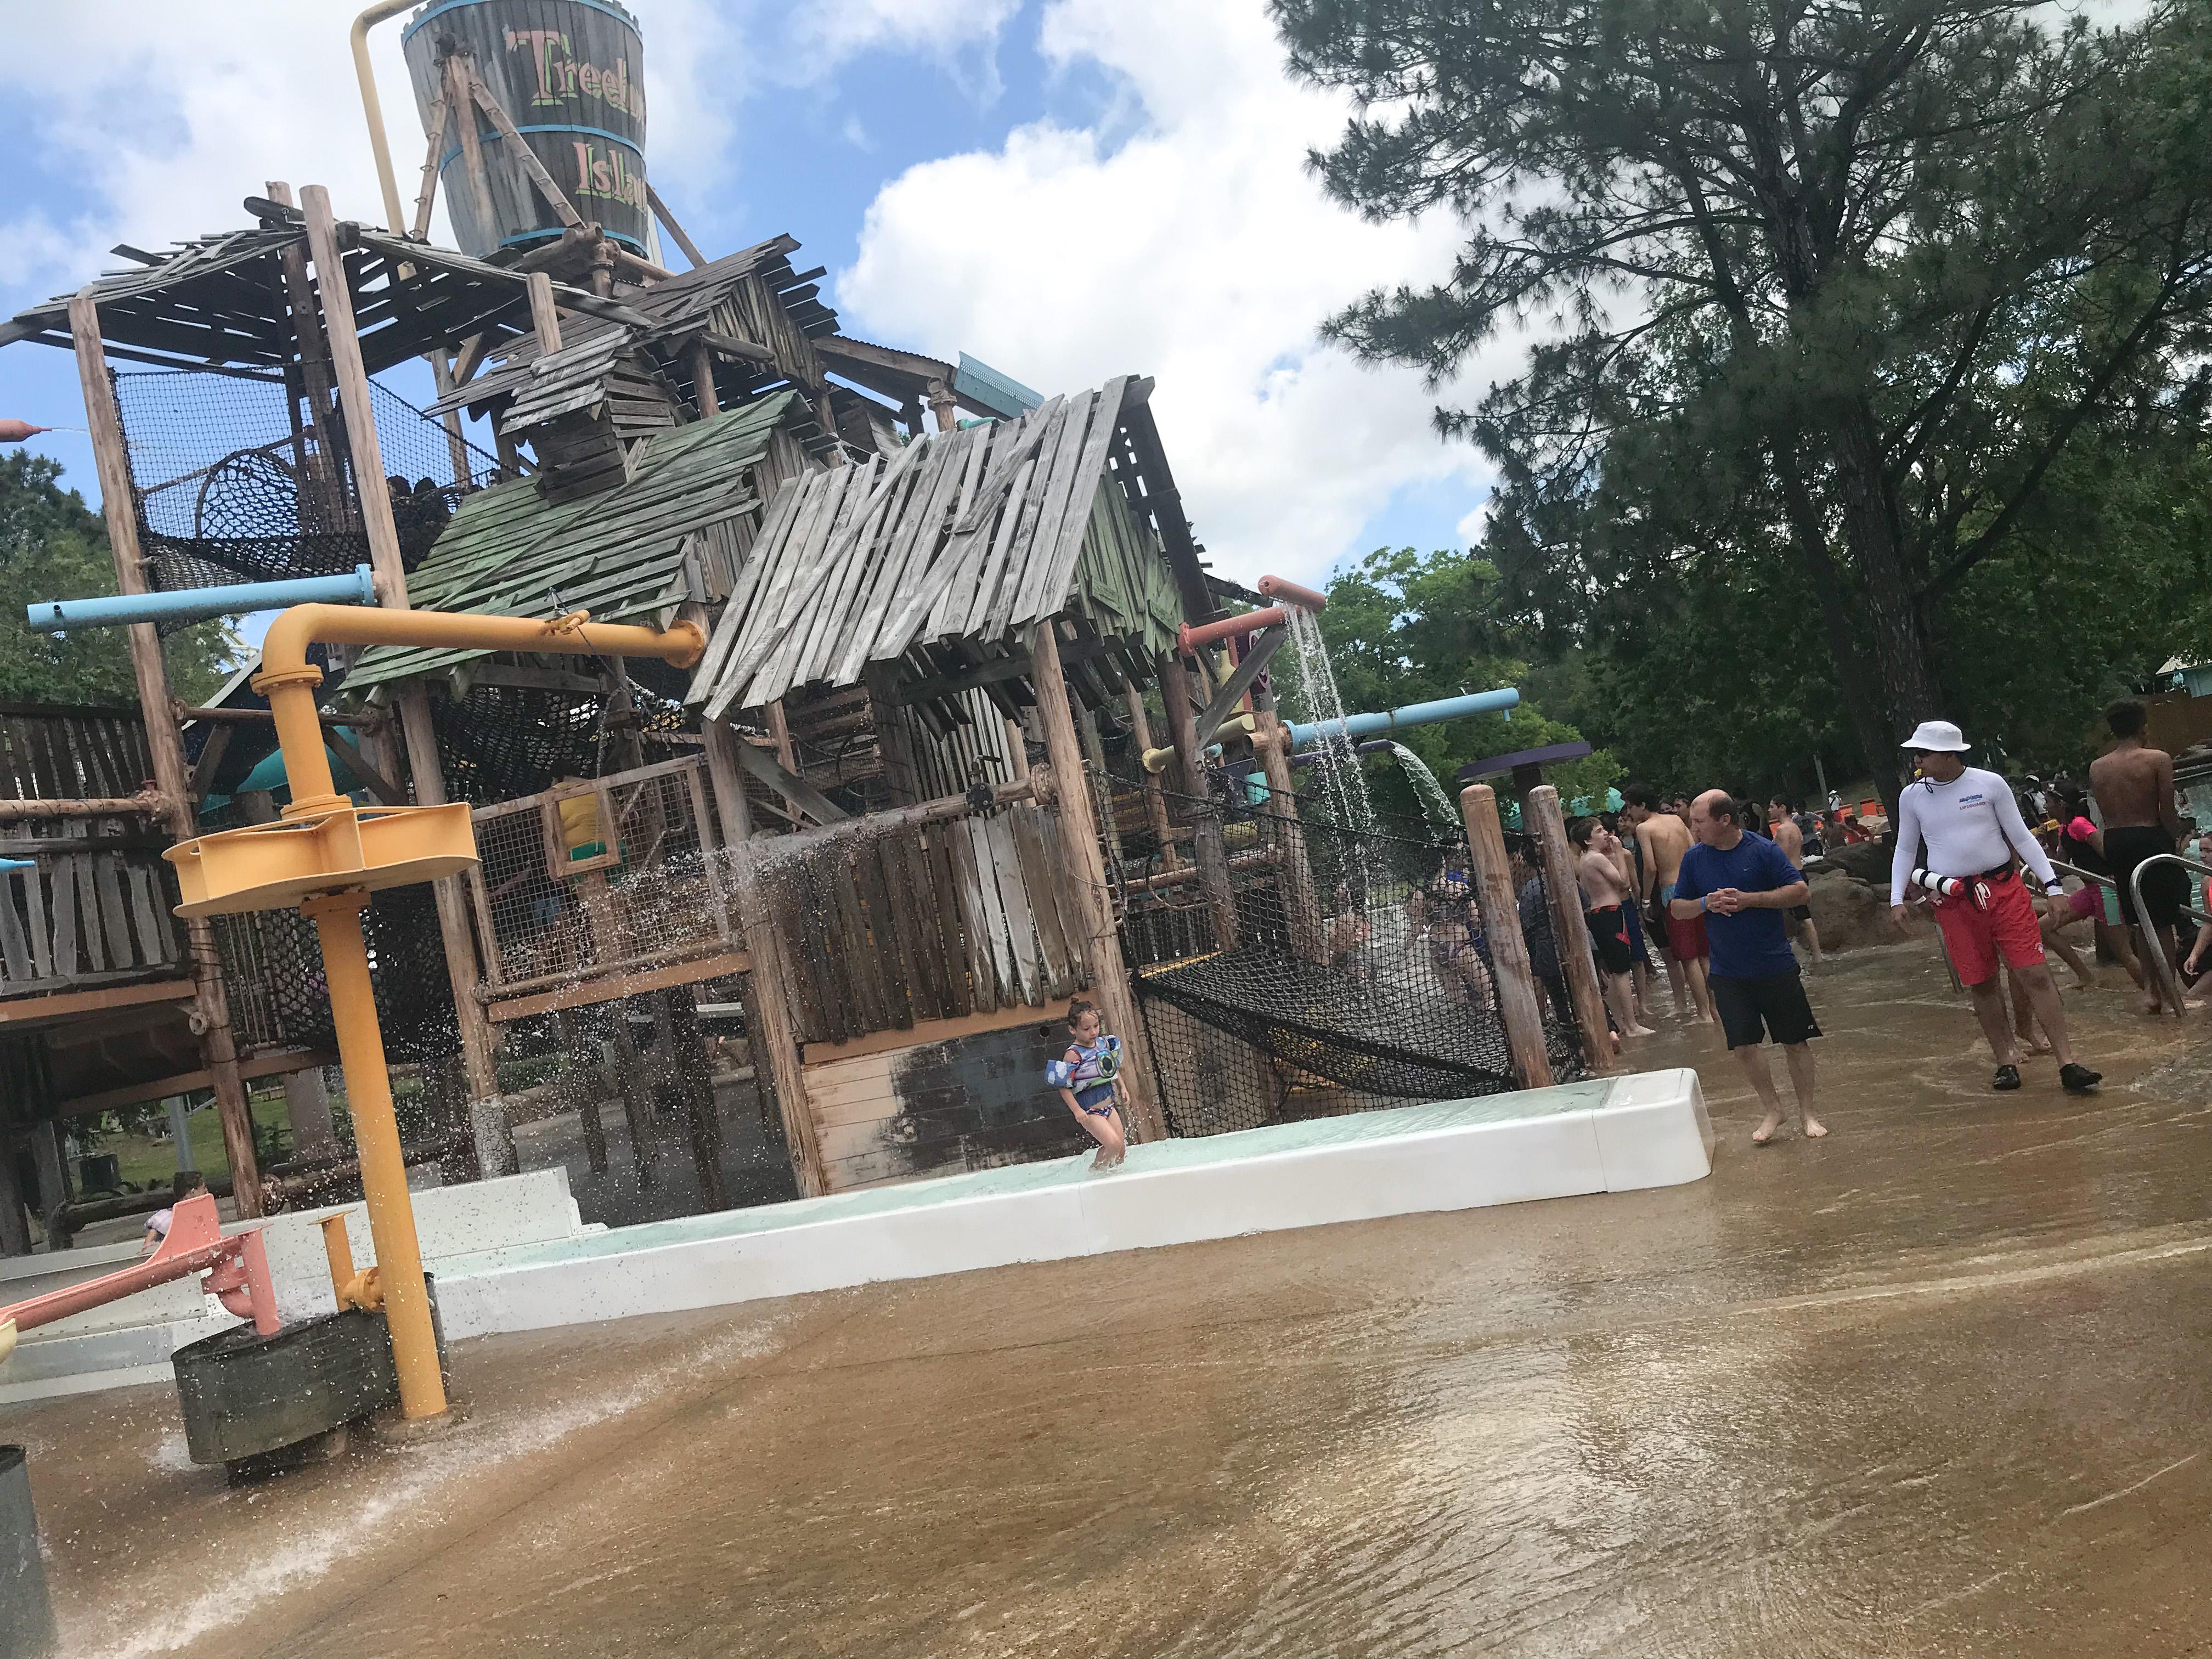 Make an Epic Start to Summer 2018 at Wet 'n' Wild SplashTown